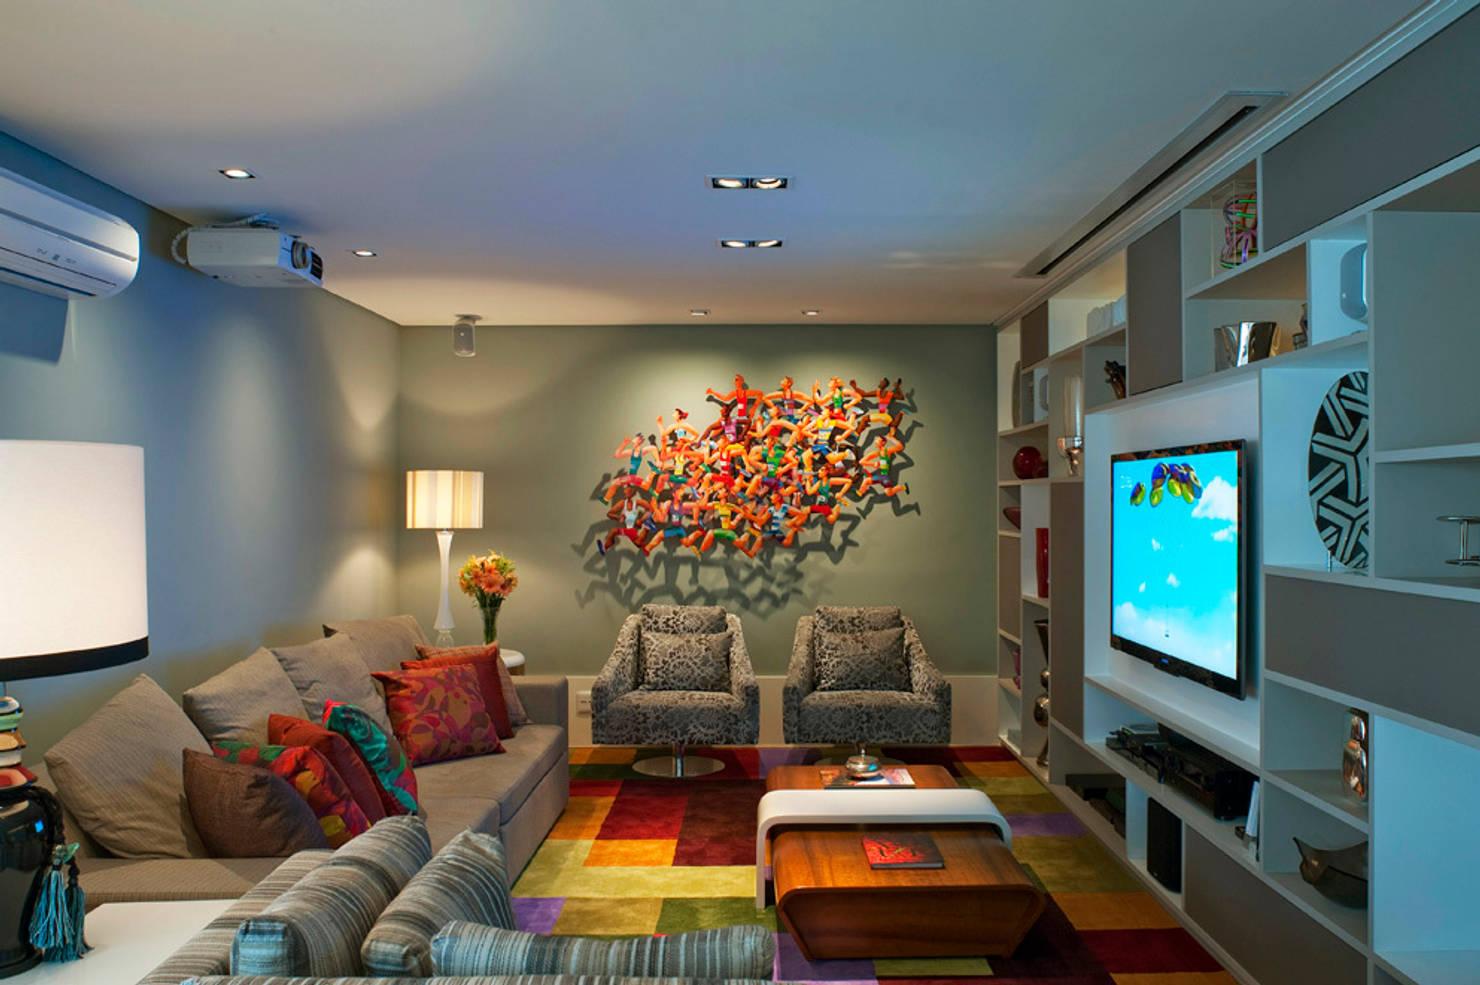 Pintura de interiores: como pintar sua casa como profissional